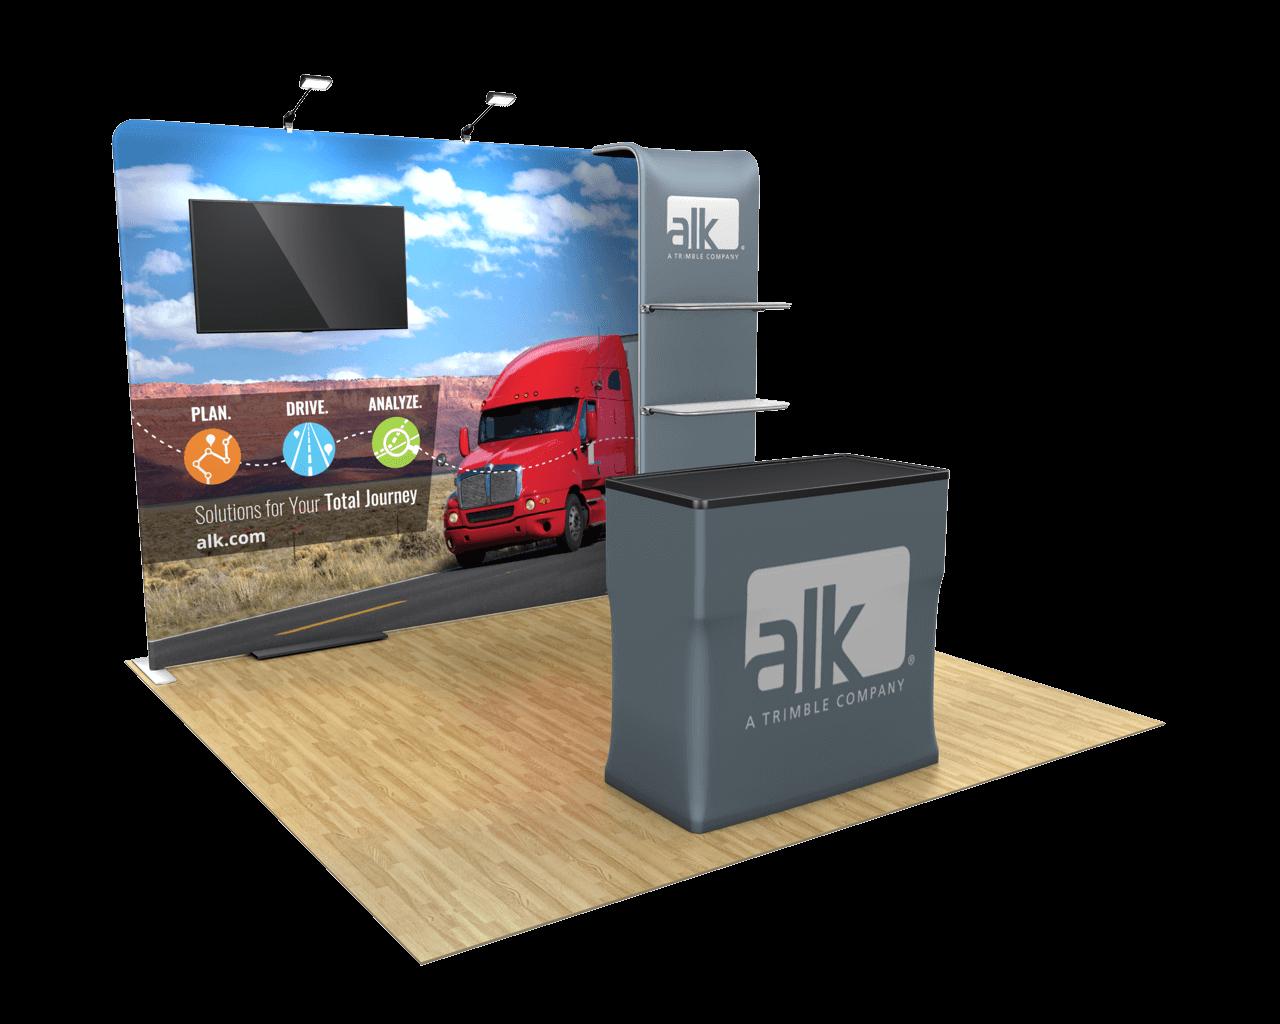 Waveline Media 10ft Trade Show Display Kit - 10.11